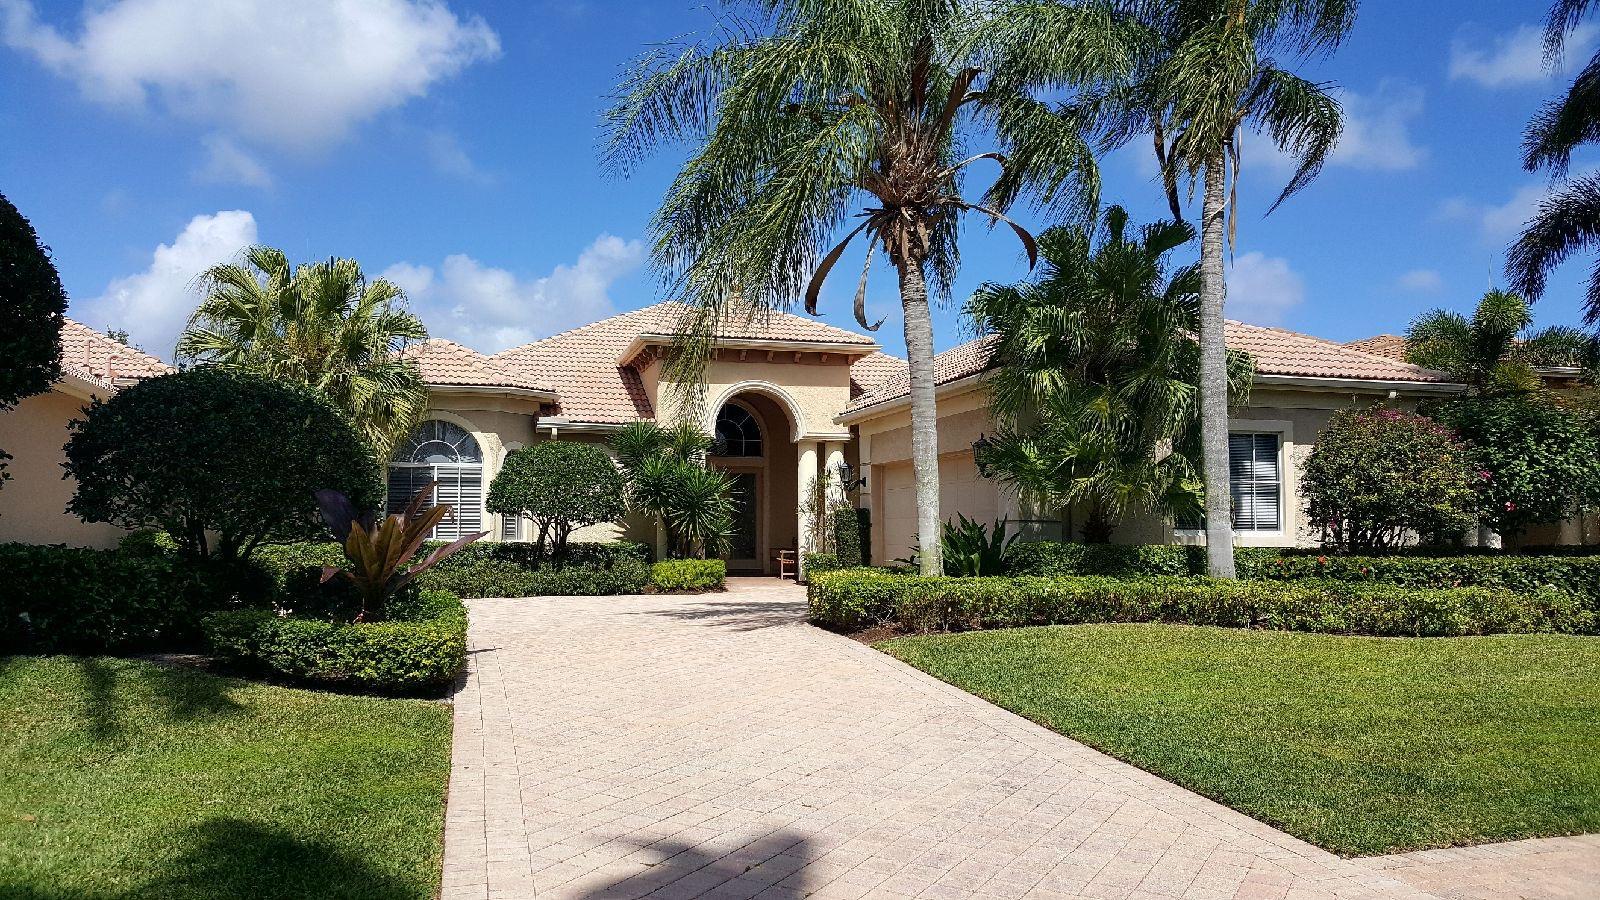 111 Vintageisle Lane, Palm Beach Gardens, Florida 33418, 3 Bedrooms Bedrooms, ,4.1 BathroomsBathrooms,A,Single family,Vintageisle,RX-10608601